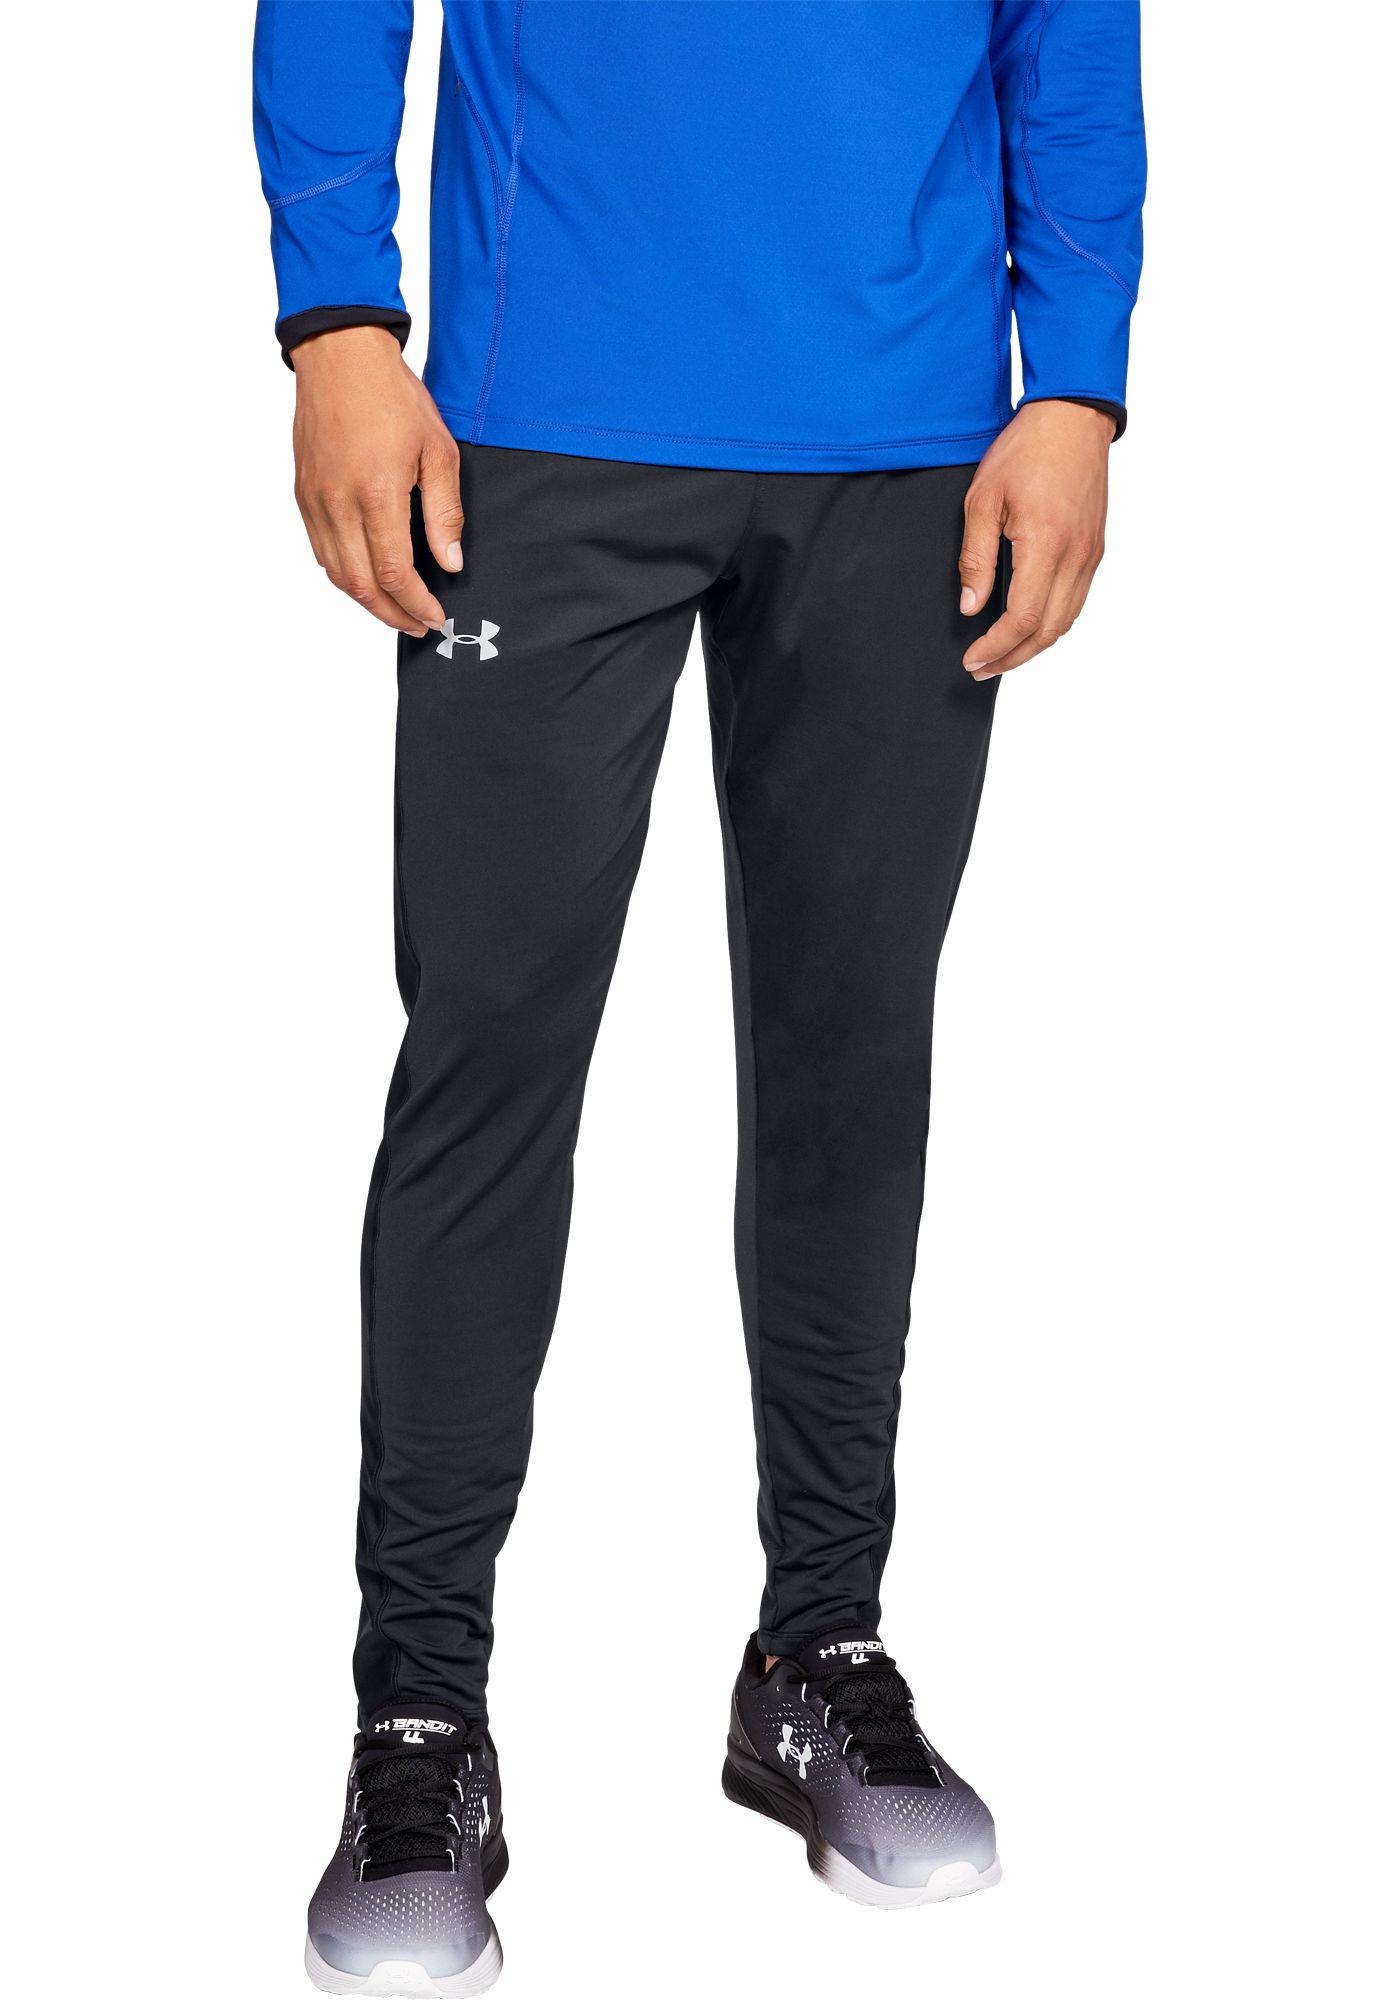 Under Armour Men's Dual-layer ColdGear Running Pants